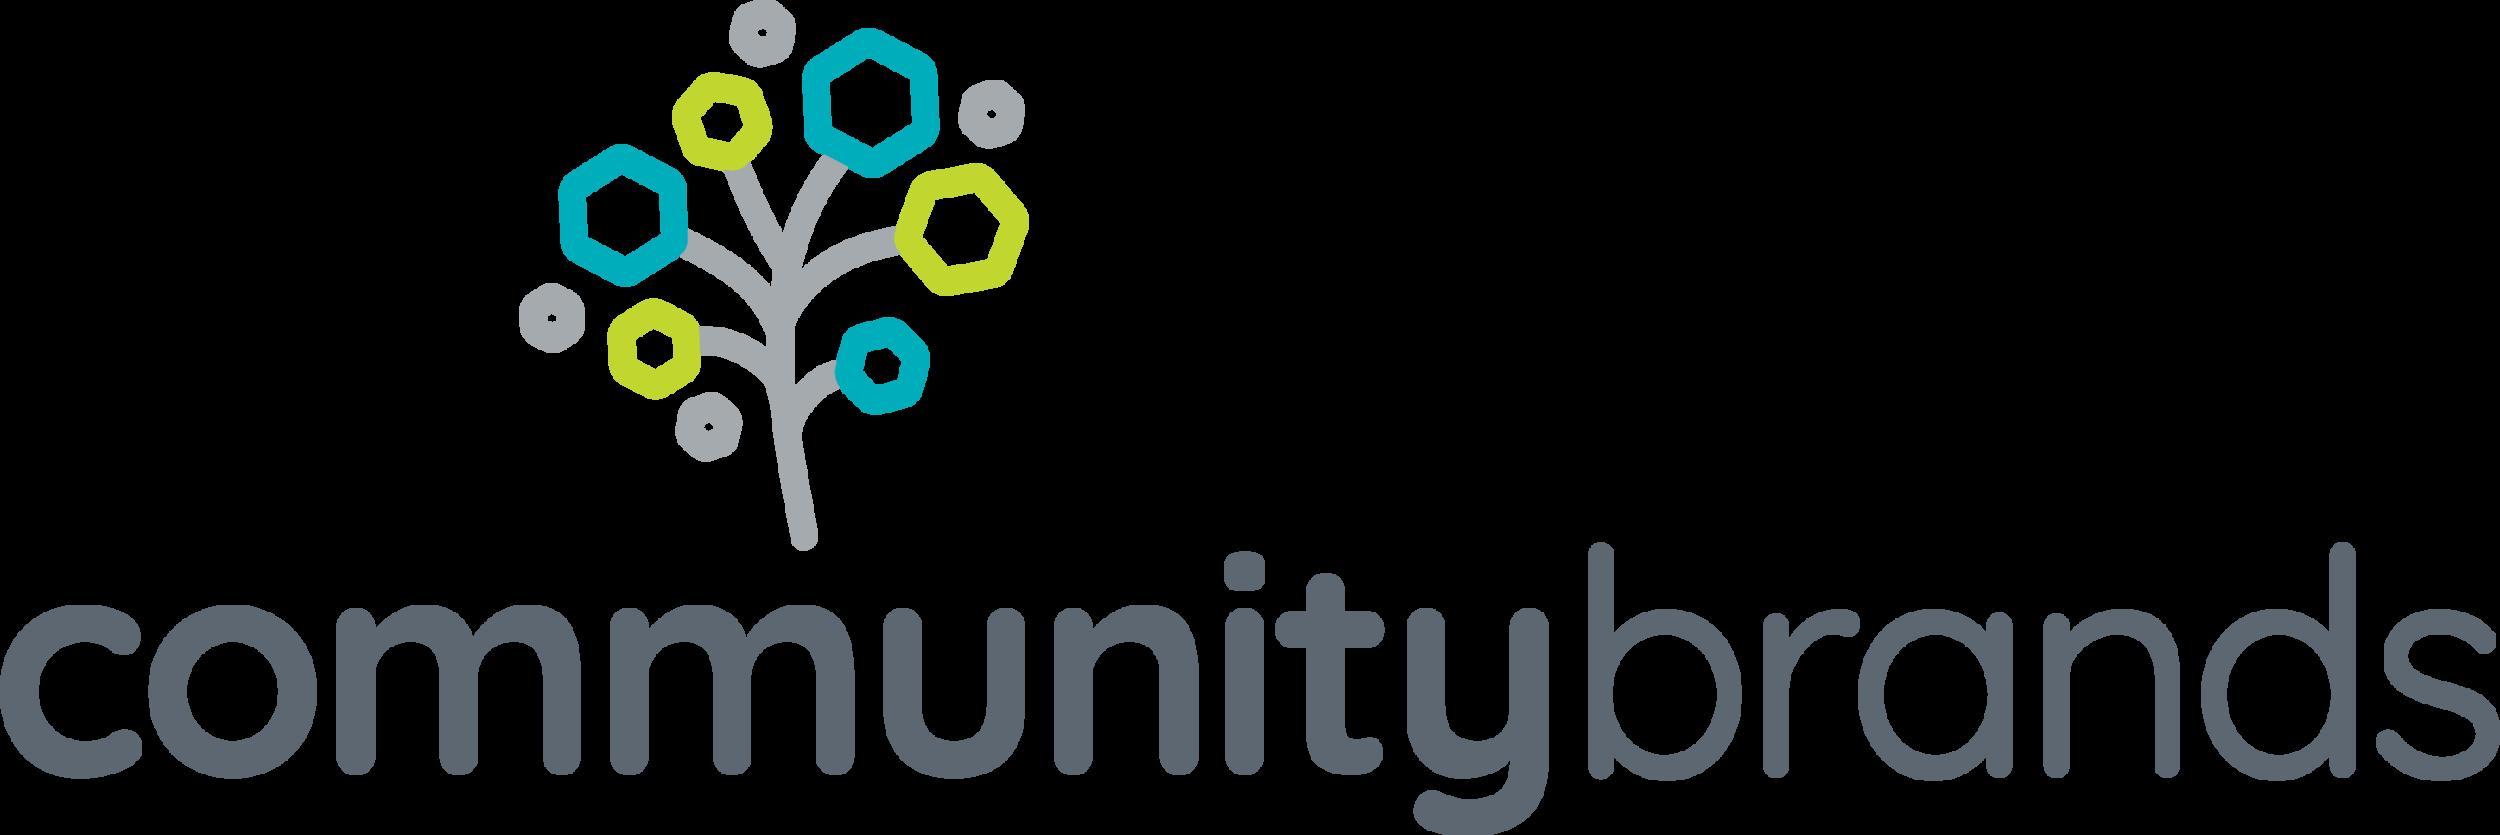 communitybrands-logo-!main-4c.png